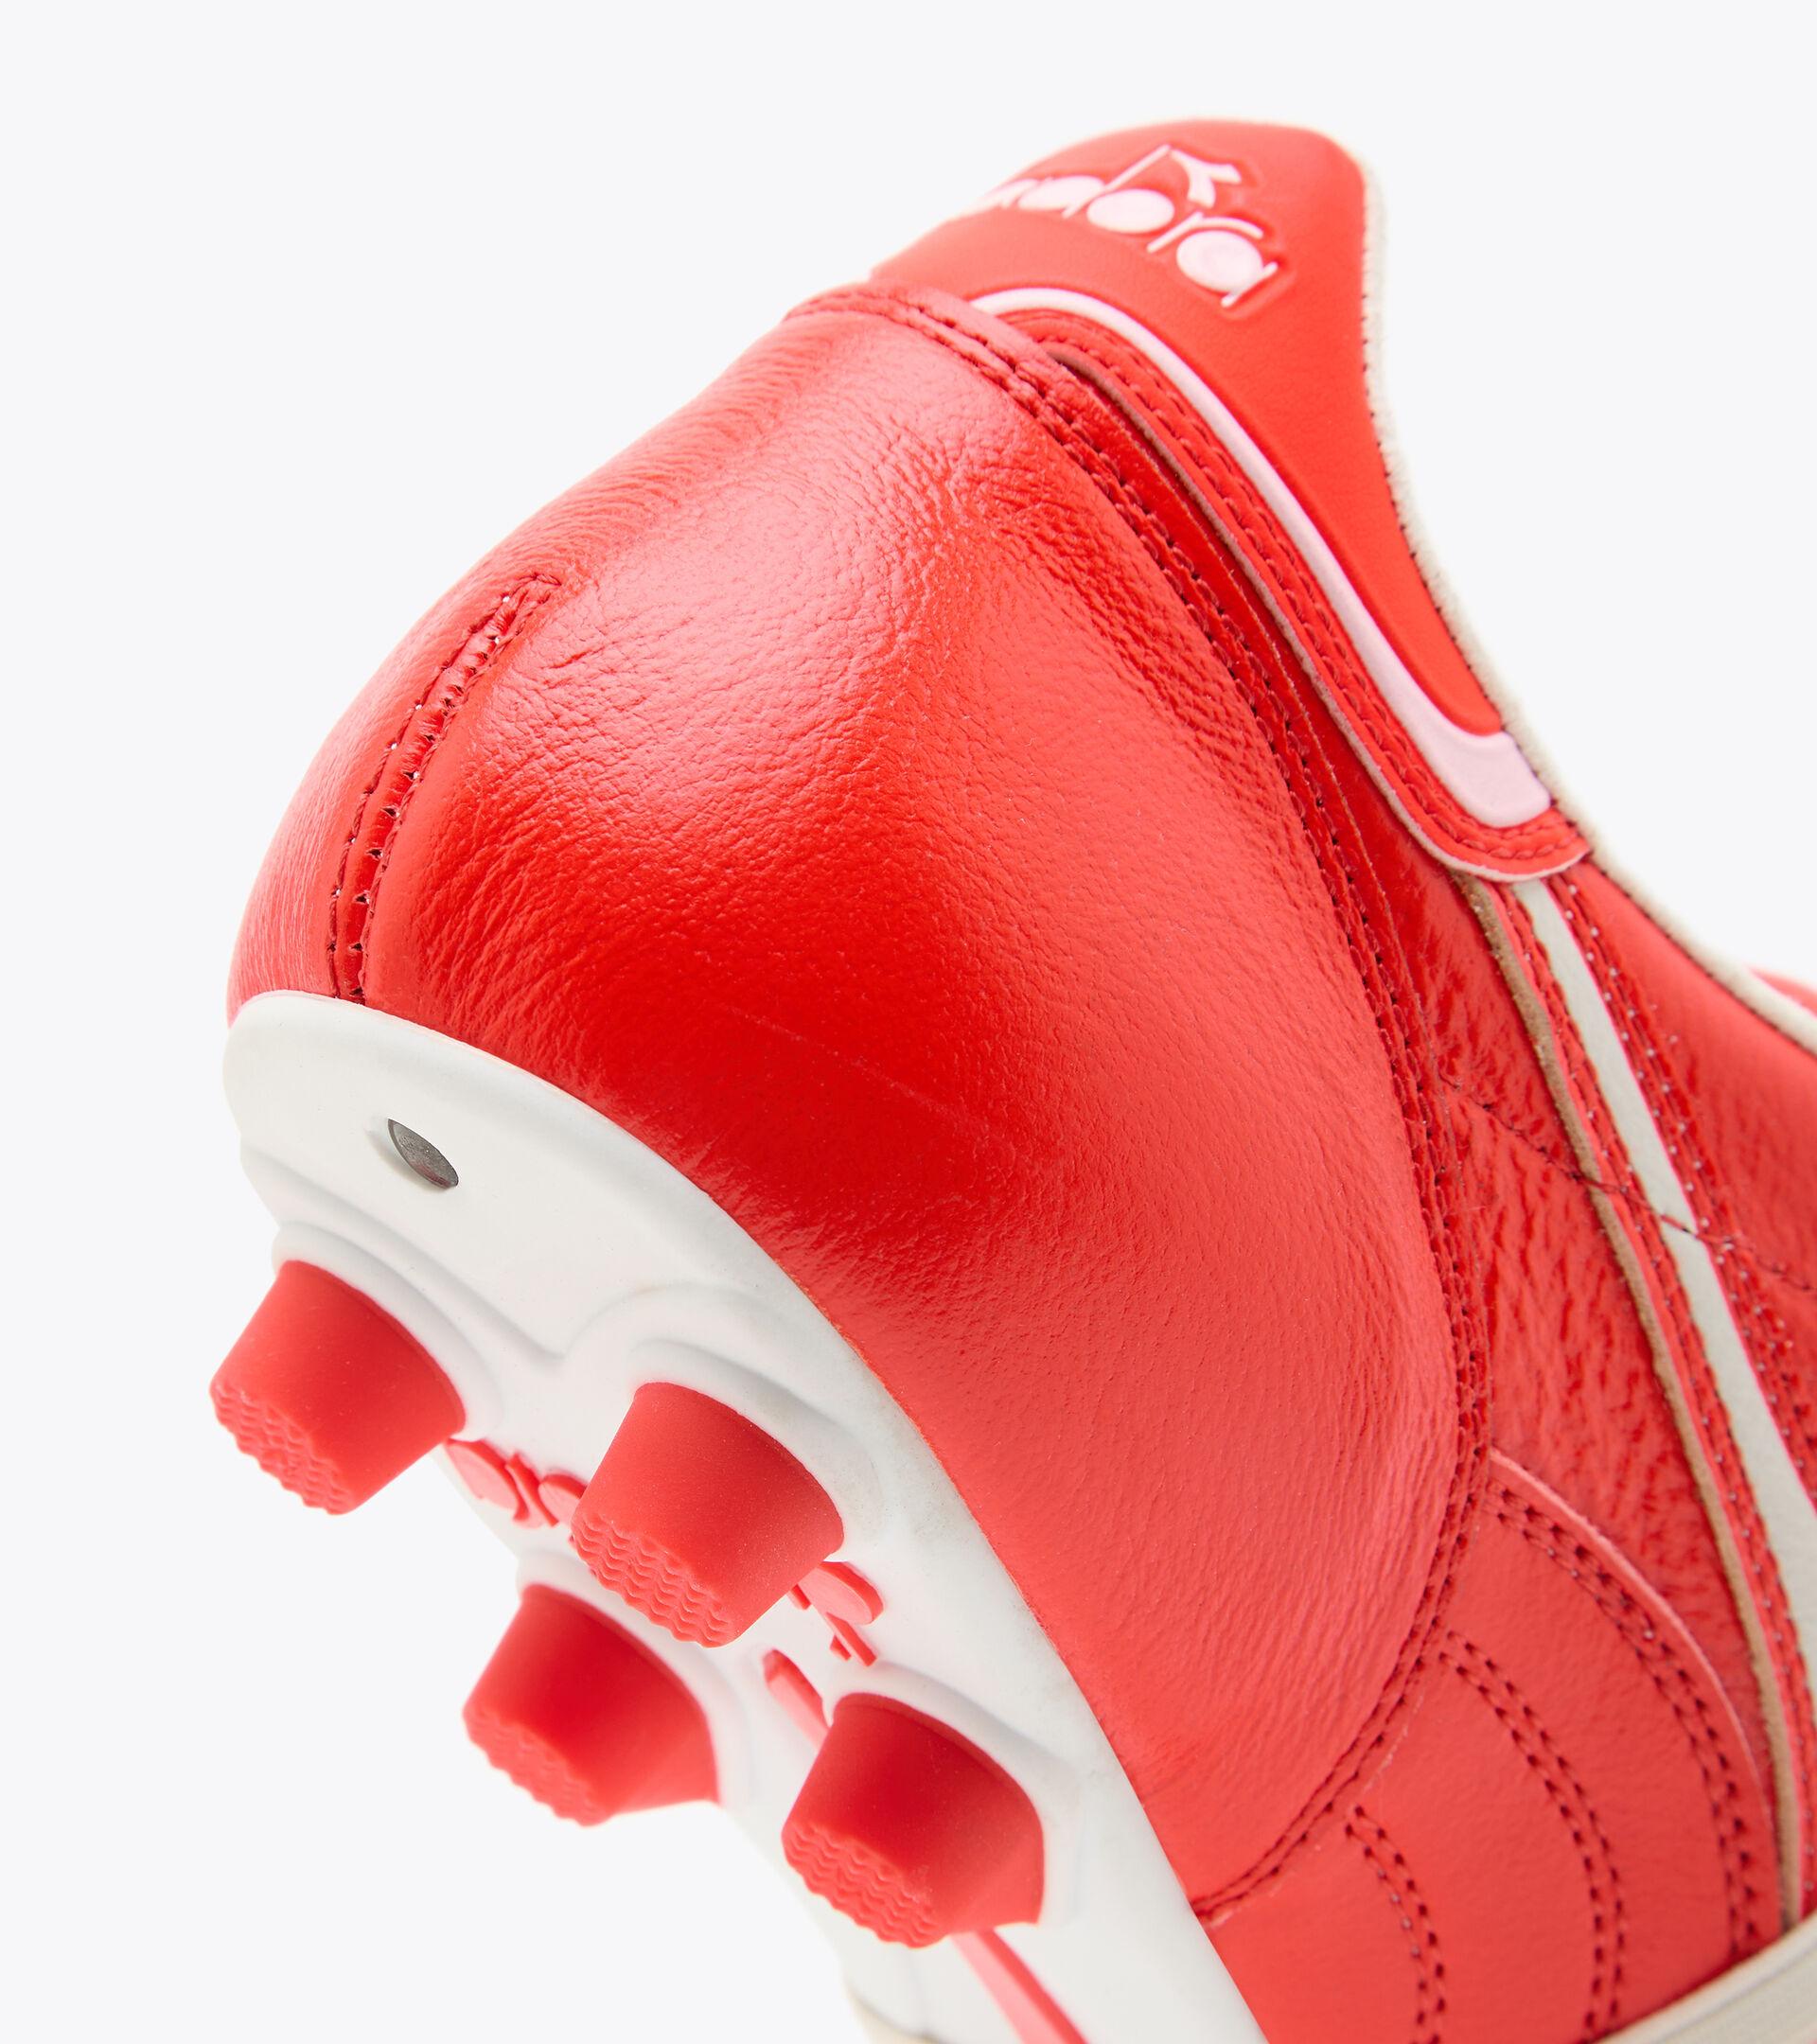 Footwear Sport UOMO BRASIL ITALY LT+ MDPU ROSSO FLUO/BIANCO Diadora